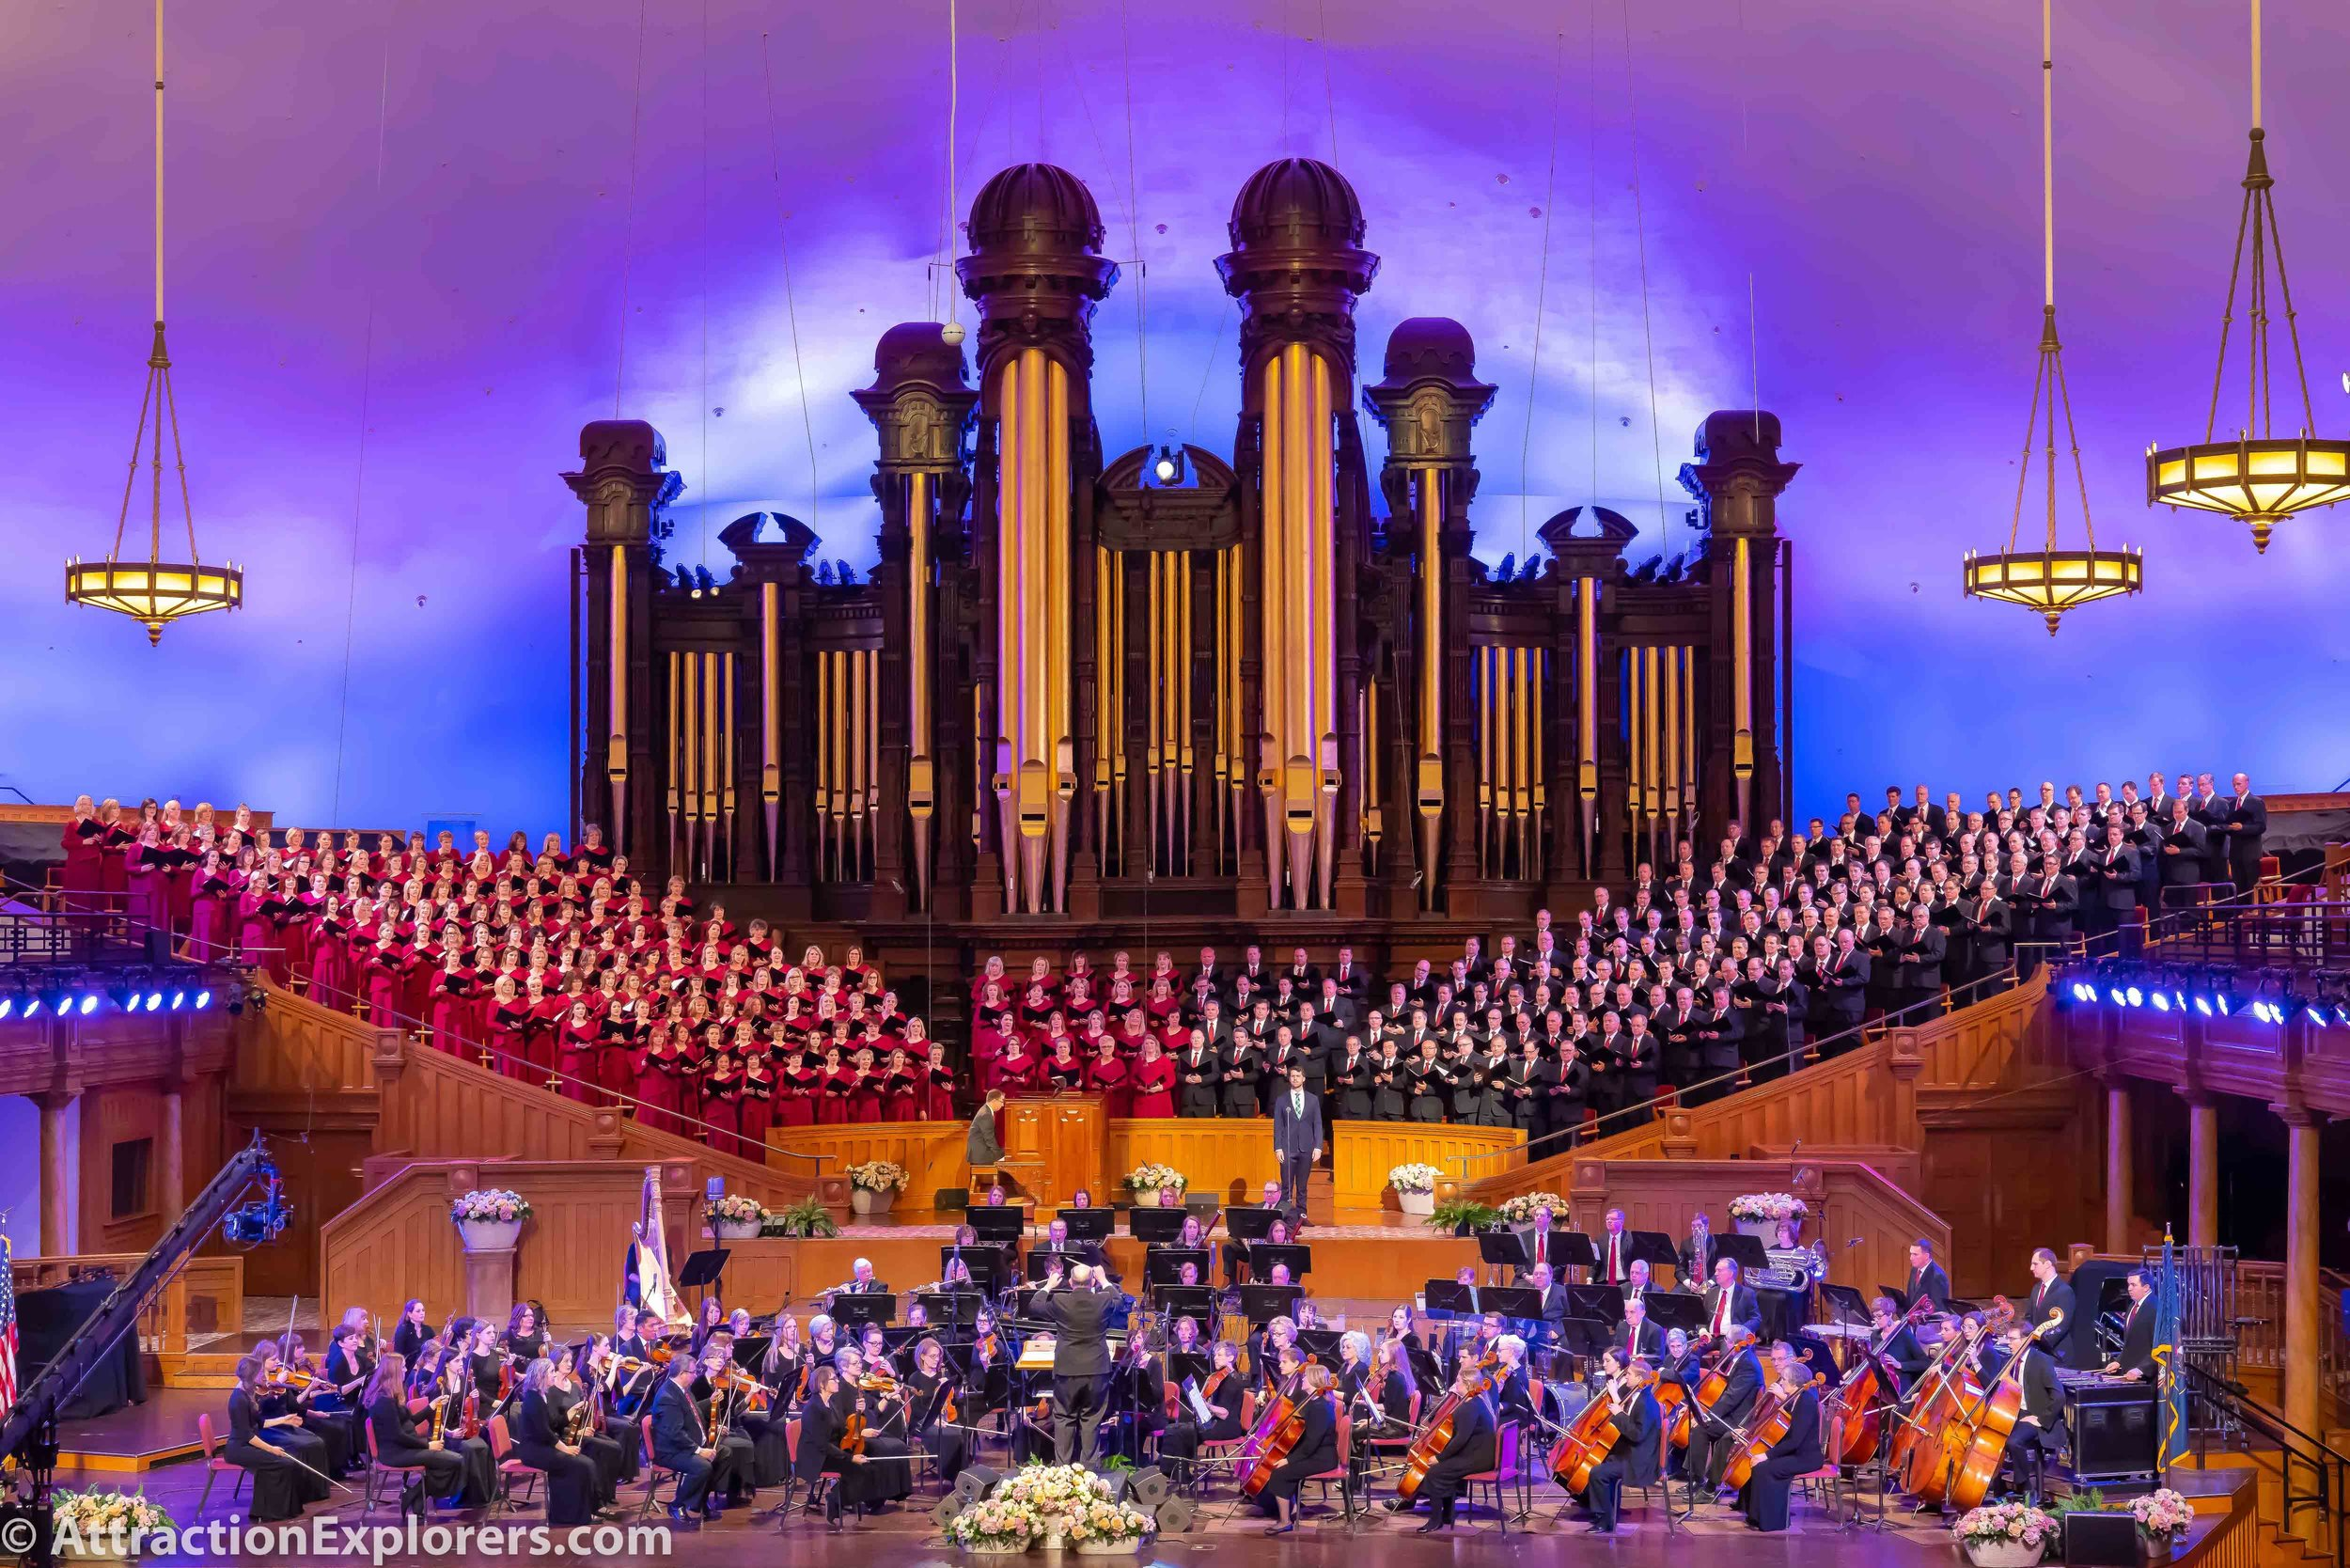 Mormon Tabernacle Choir concert and bus tour in Salt Lake City